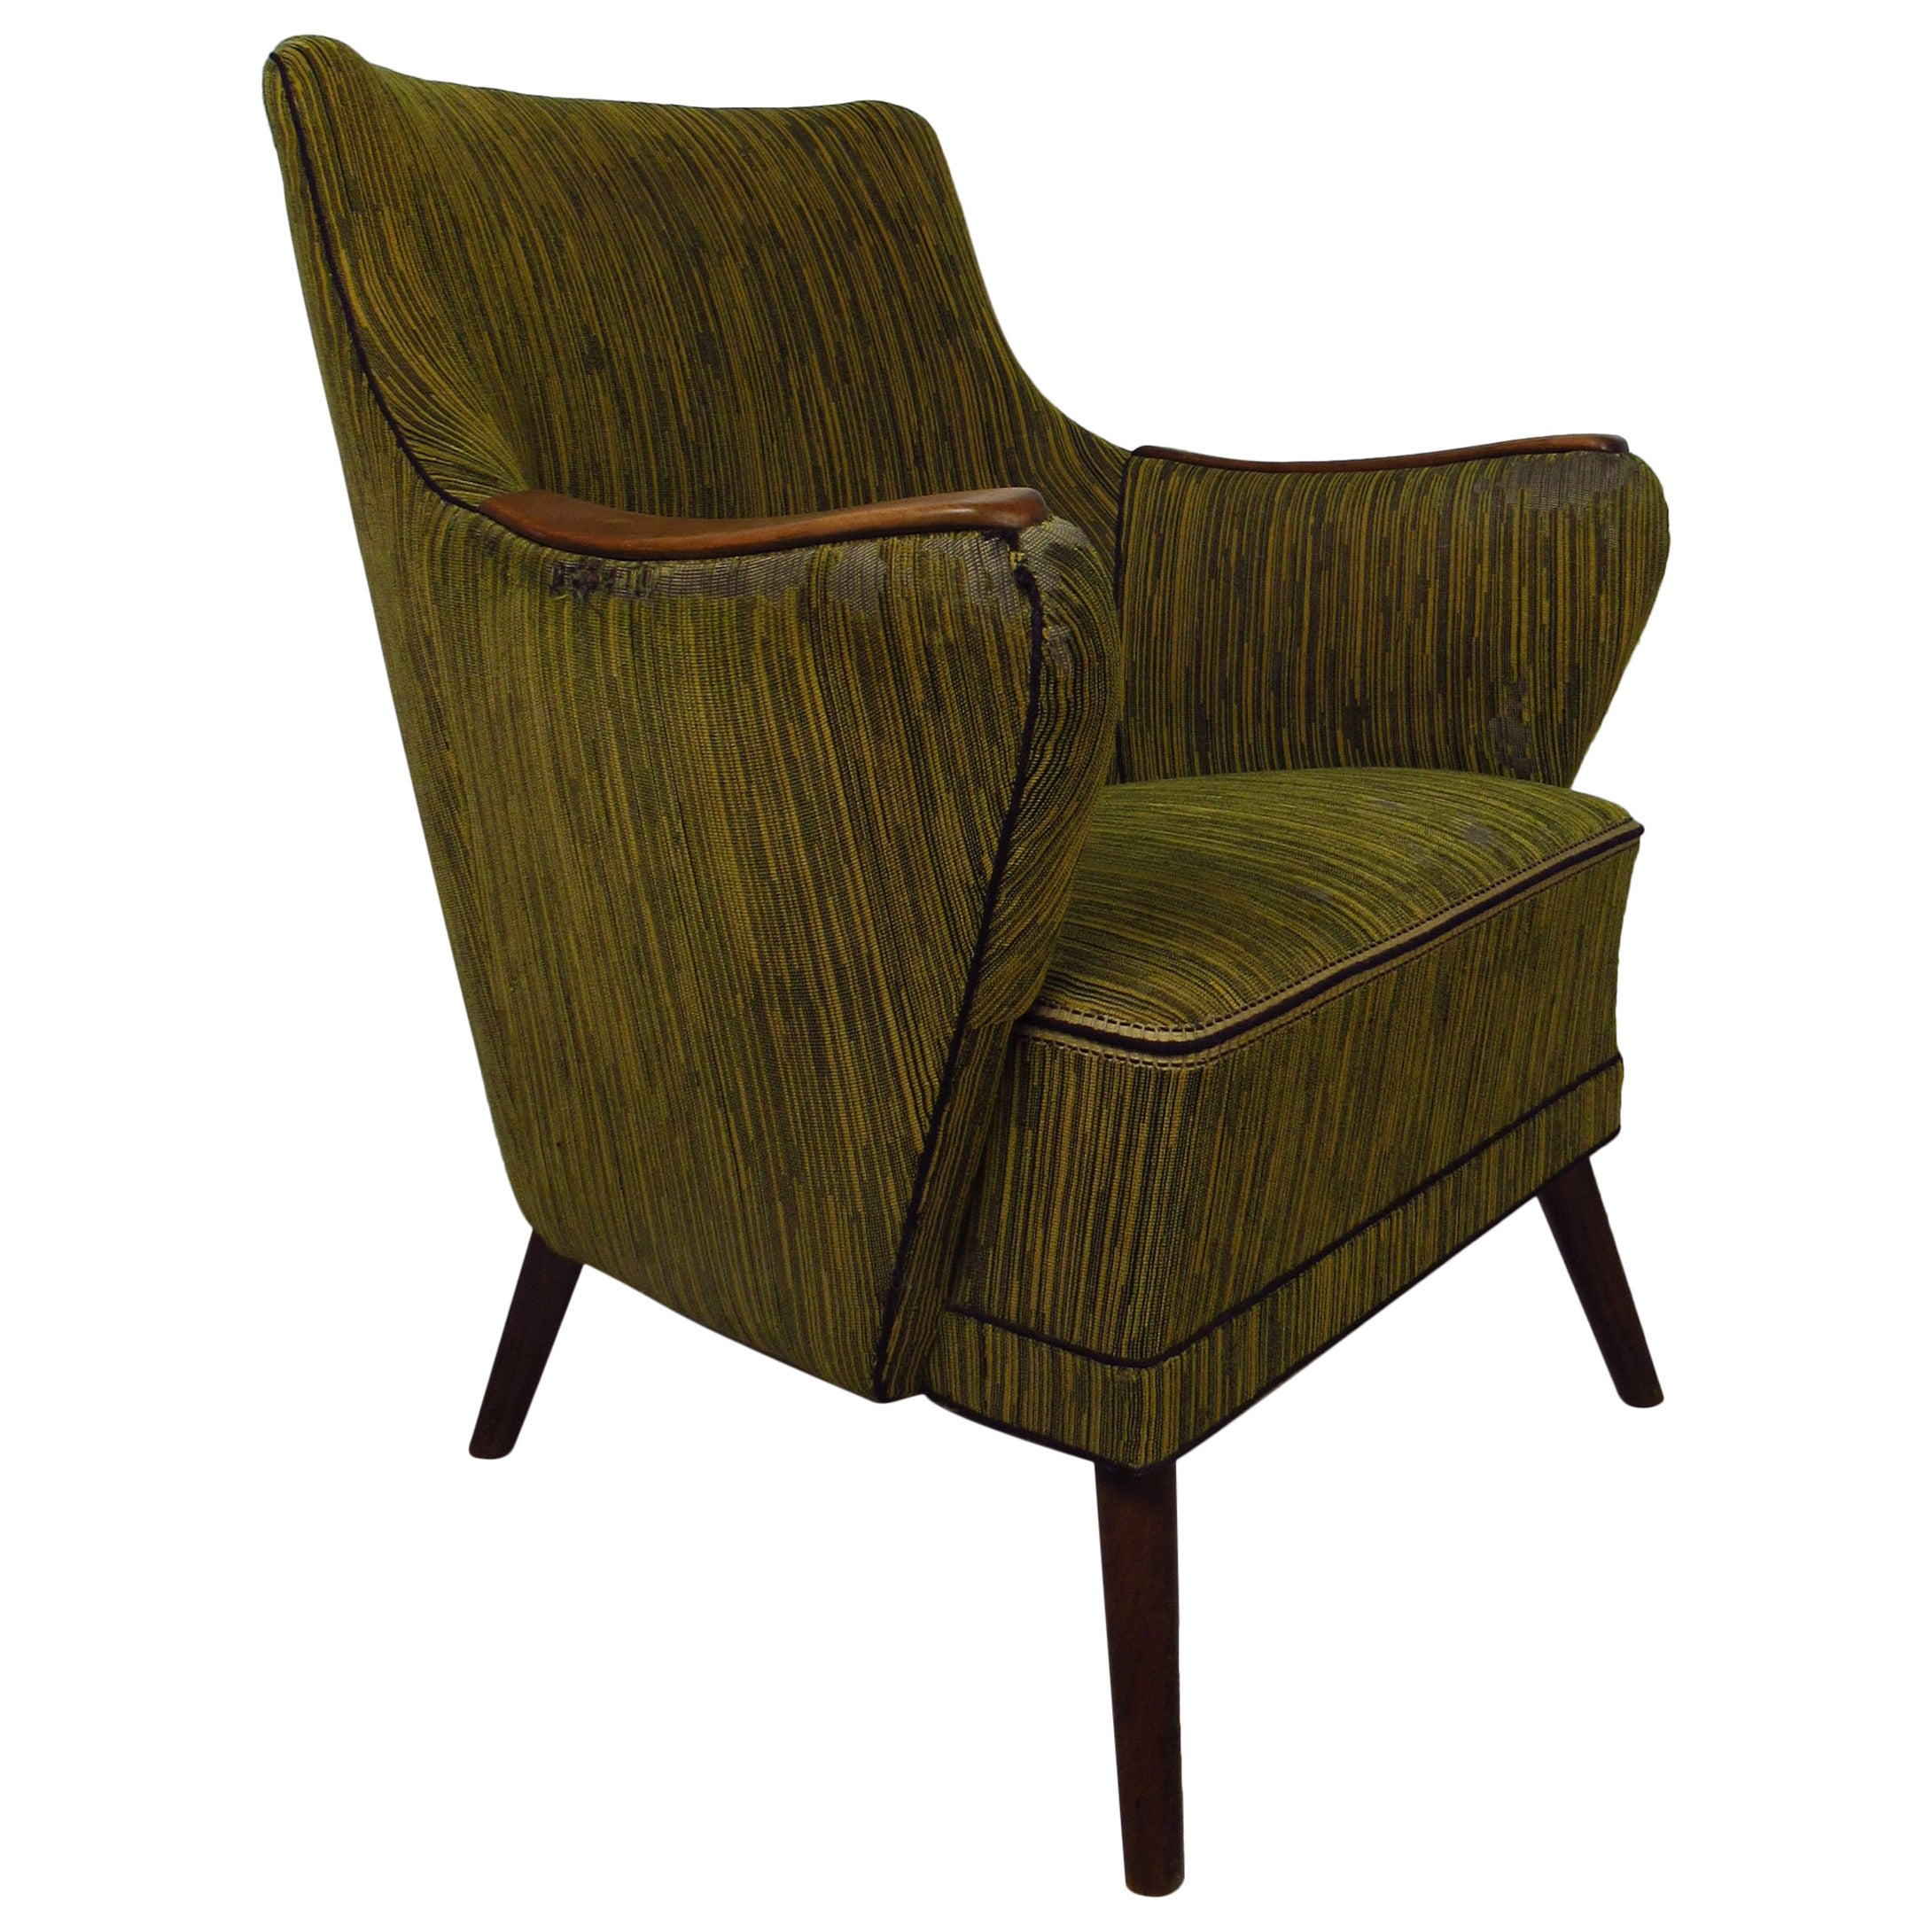 Midcentury Mogens Lassen Style Lounge Chair